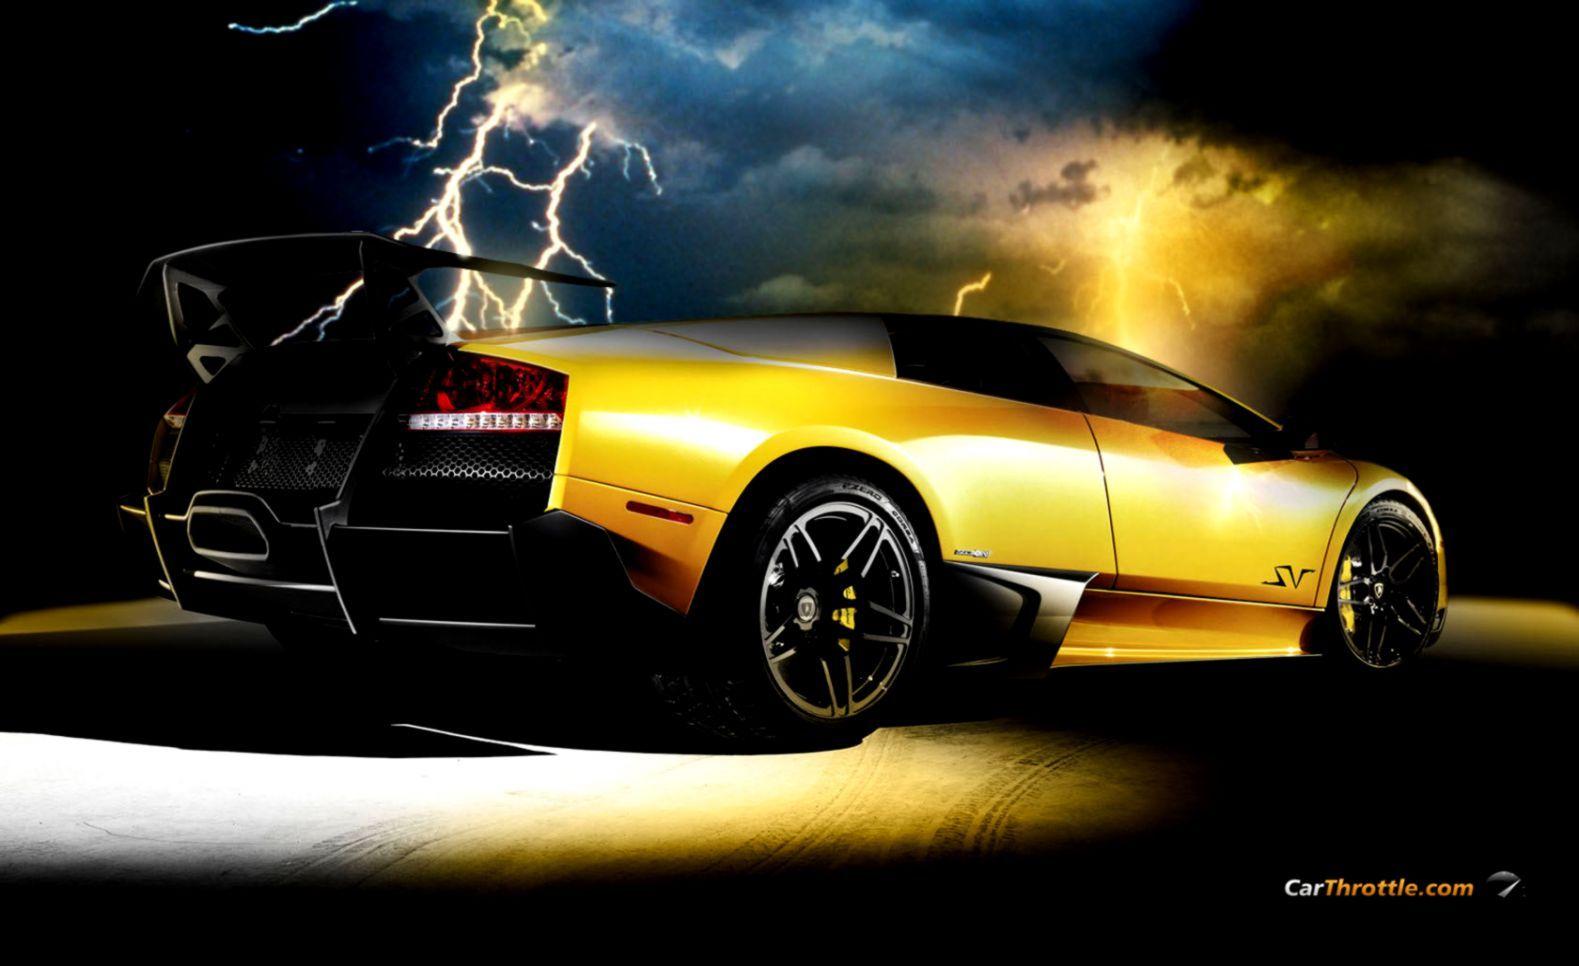 Lamborghini Wallpaper Hd Computer Yahoo Image Search Results Hd Wallpapers Of Cars Cool Wallpapers Cars Lamborghini